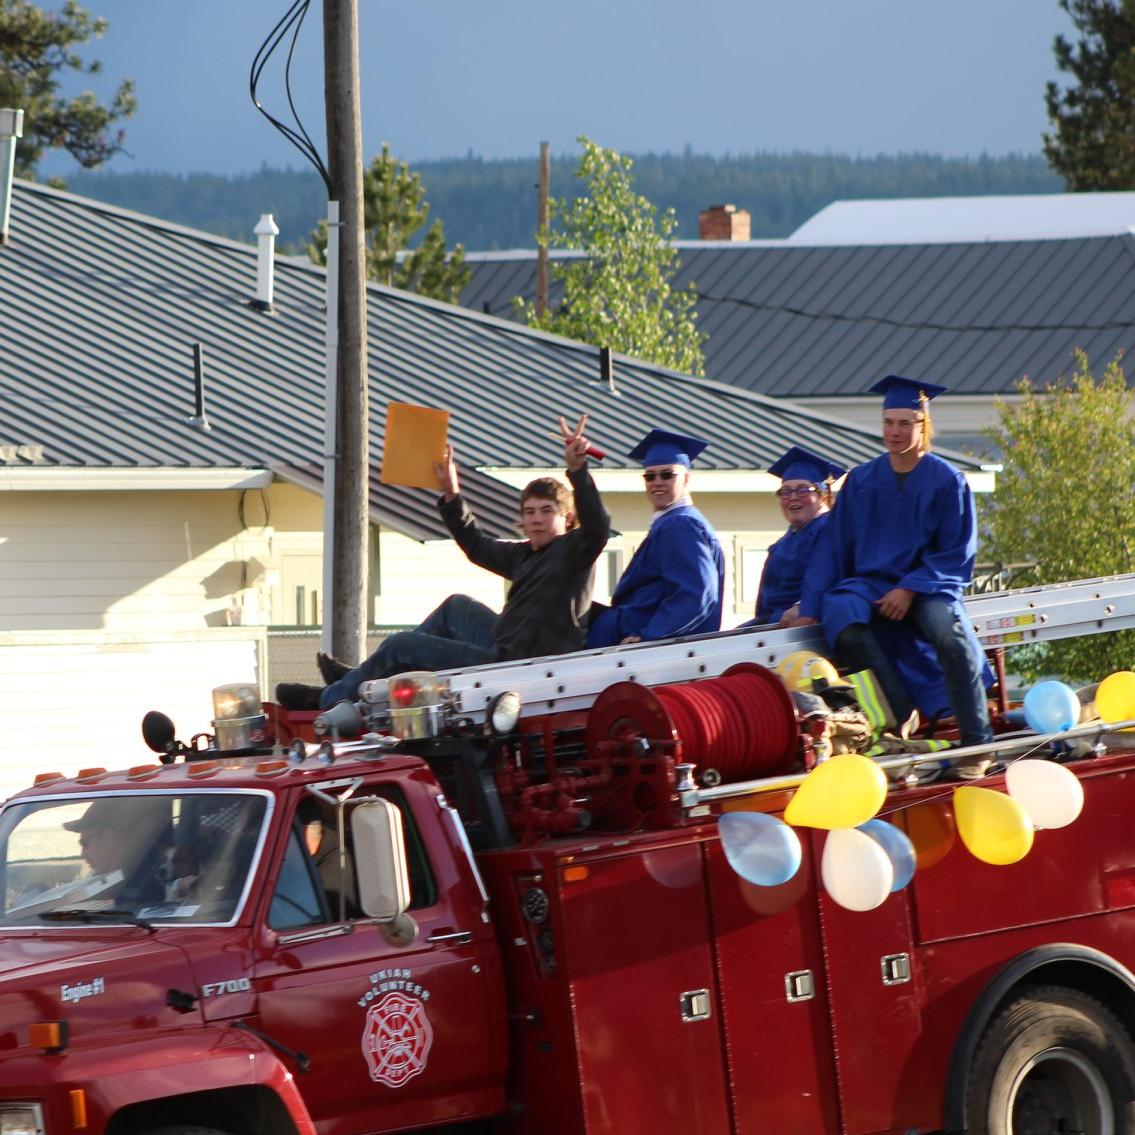 Graduating class of 2020 on fire truck